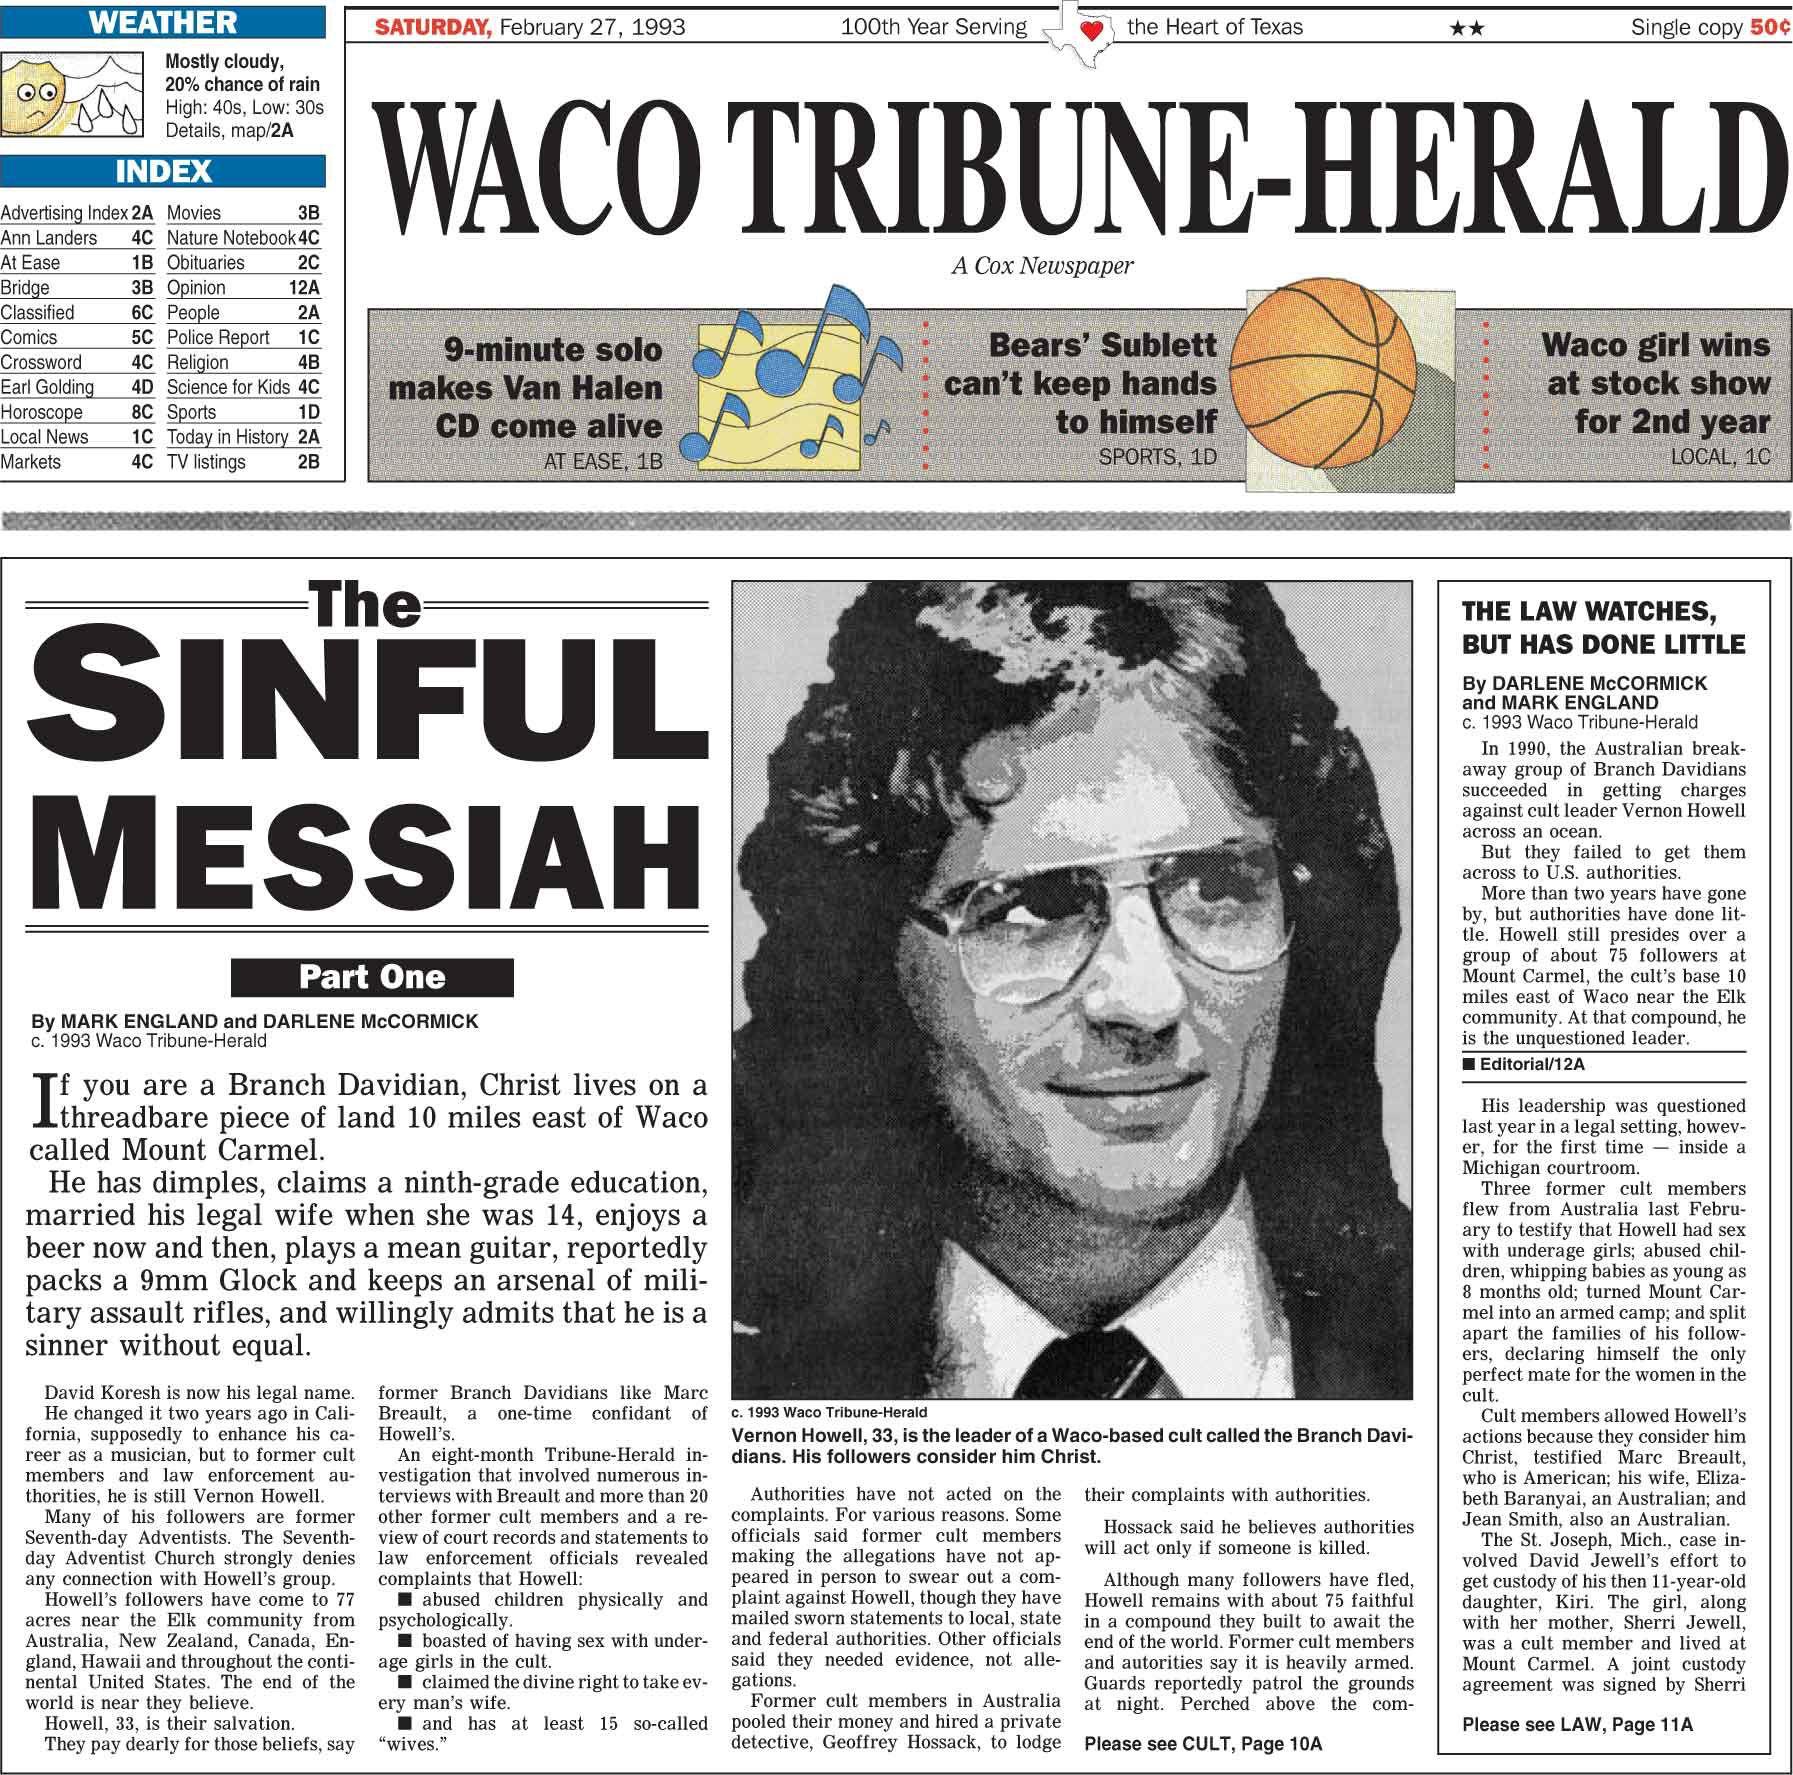 Waco Tribune-Herald of Feb. 27, 1993: The Sinful Messiah, Part 1